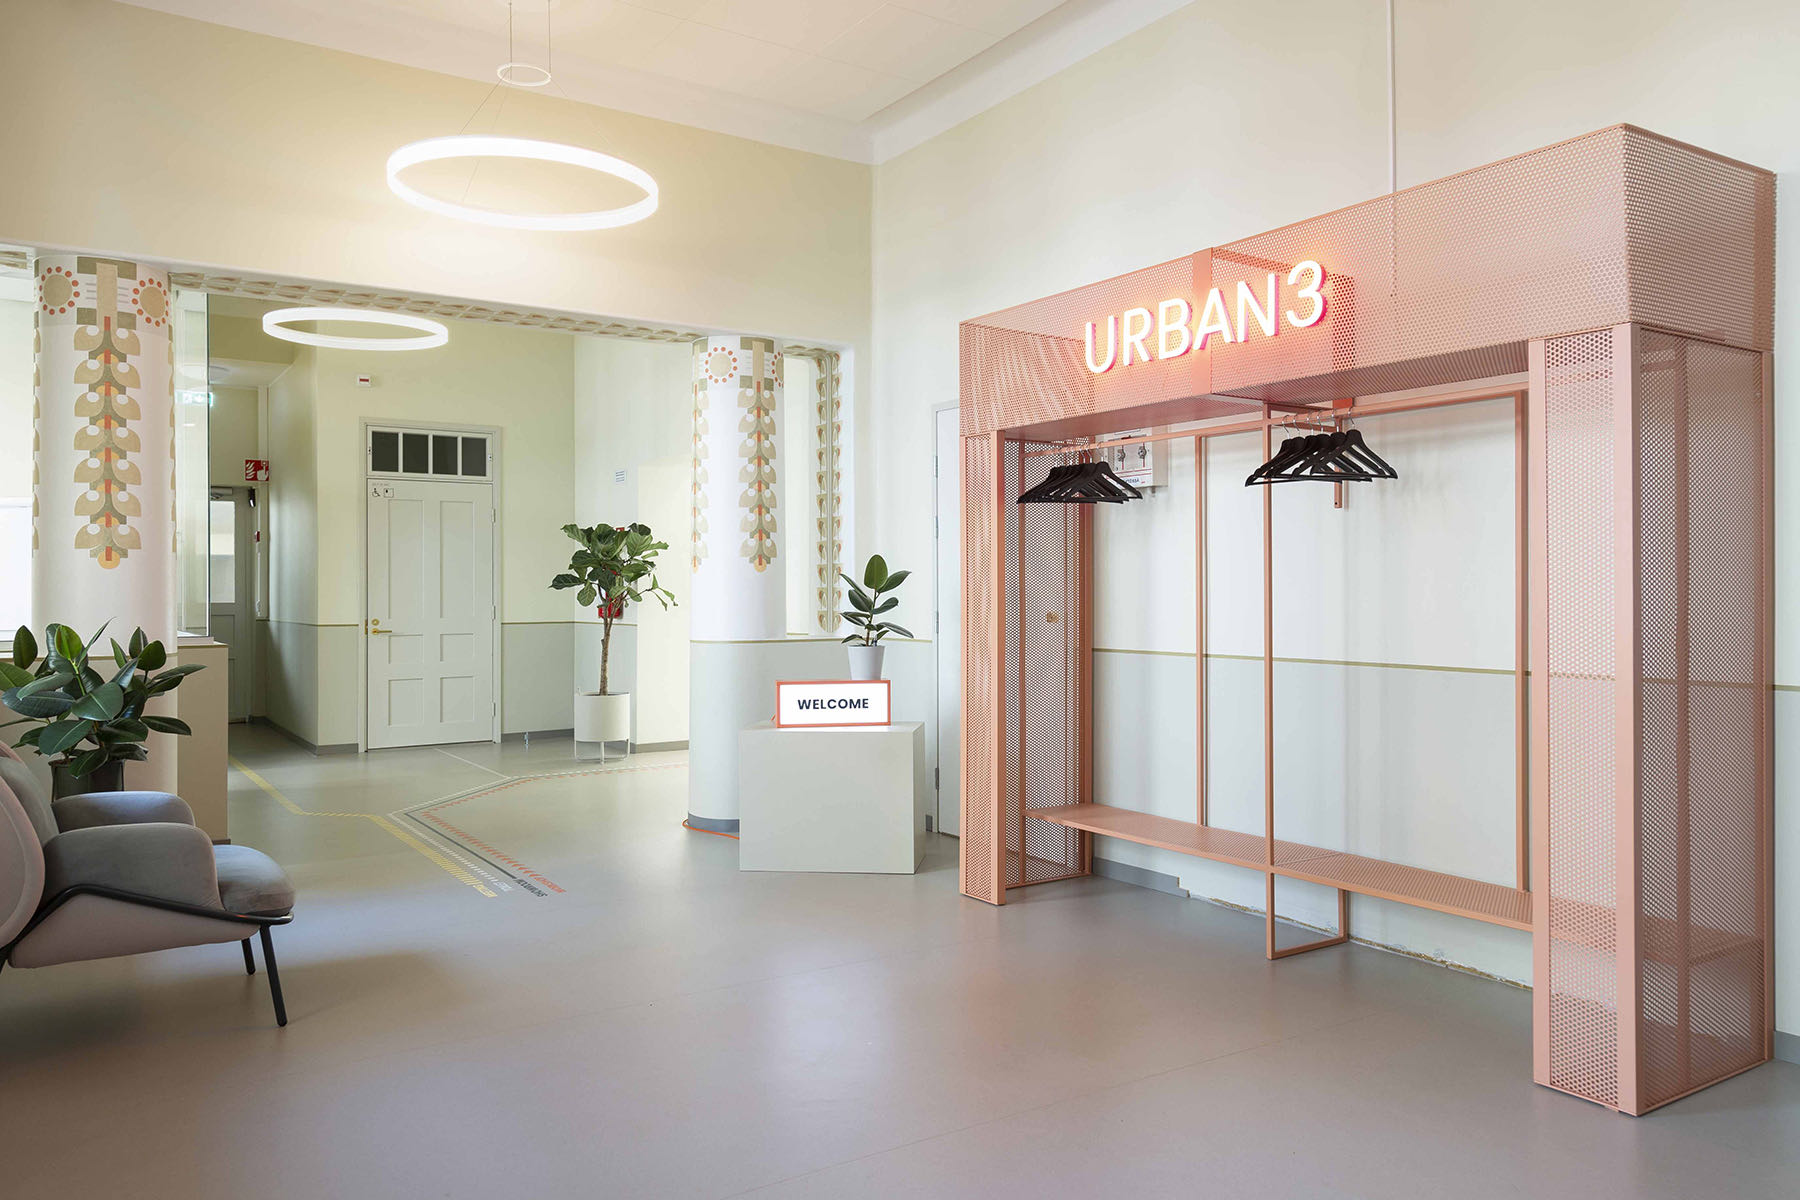 urban3-coworking-helsinki-3